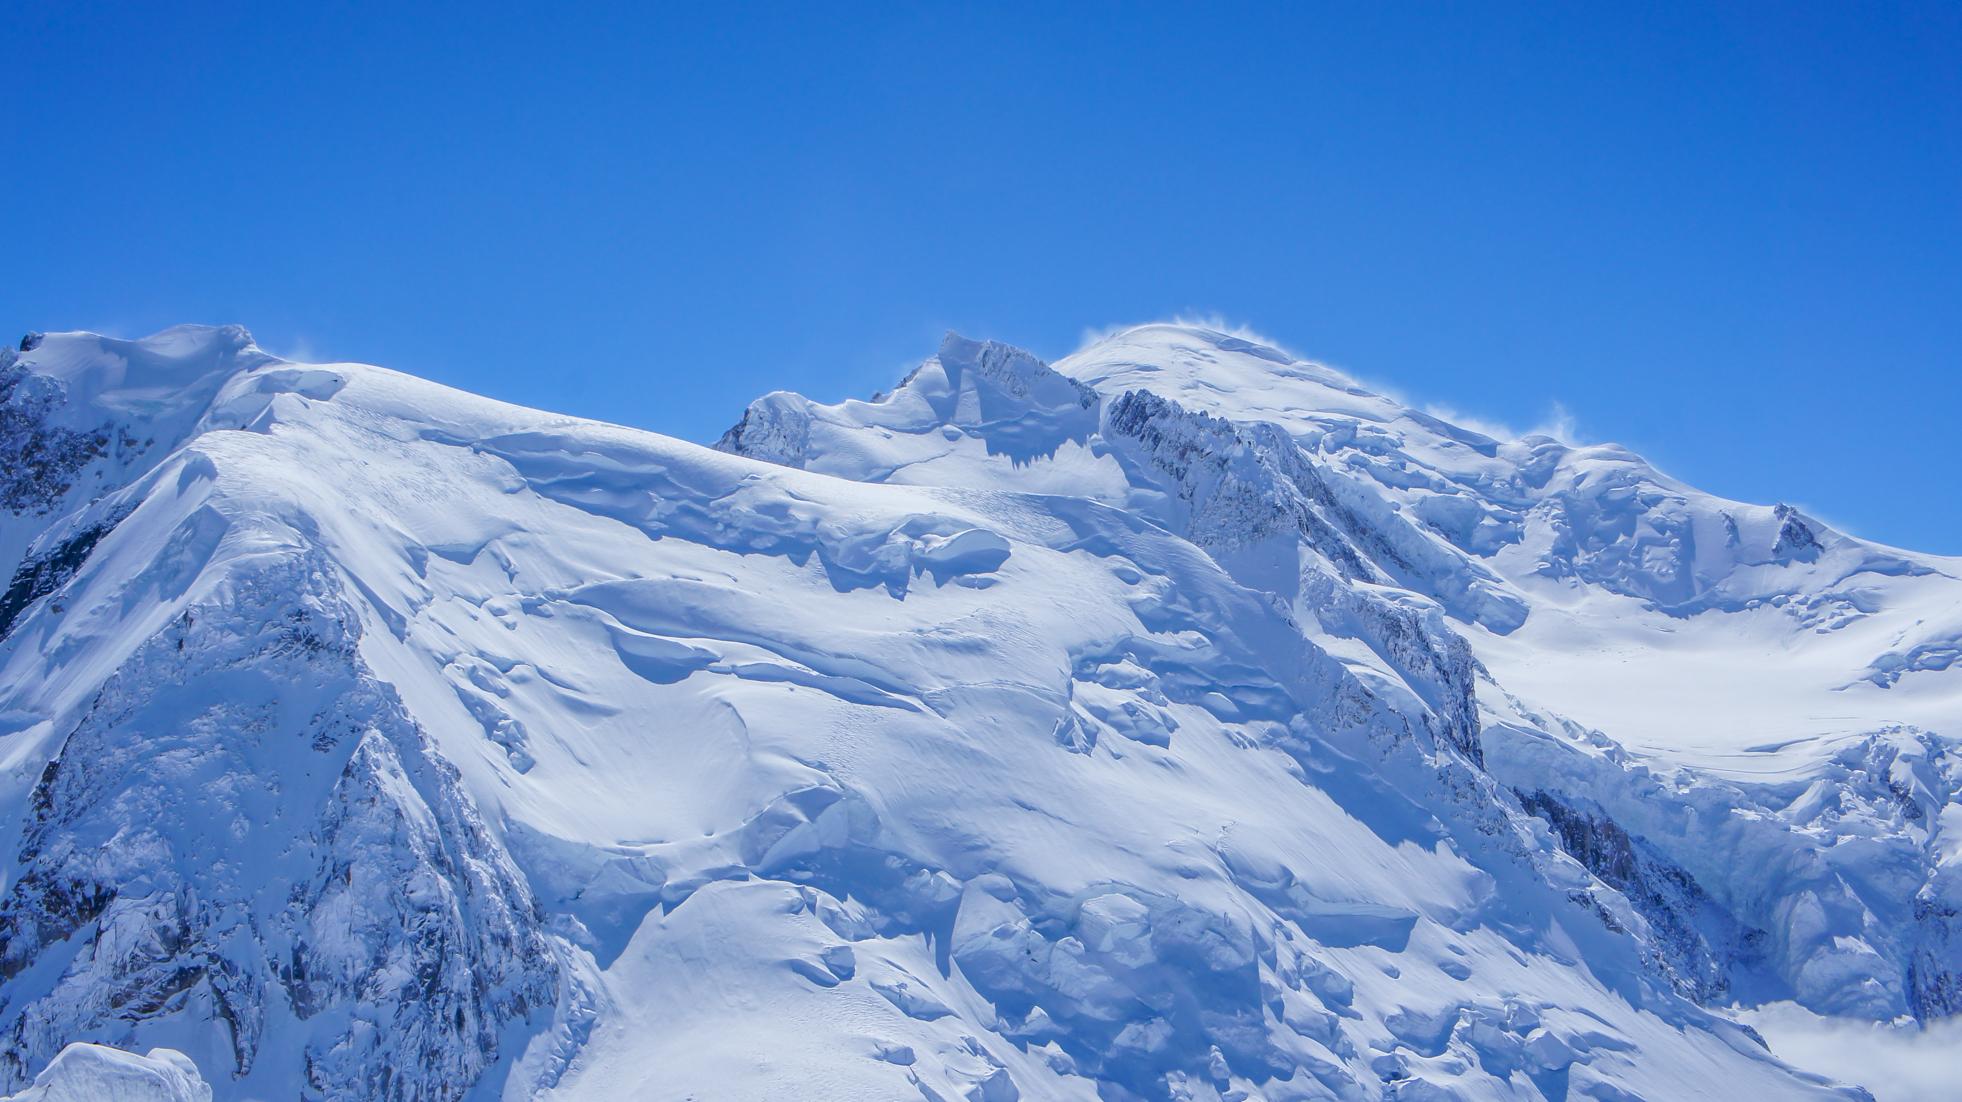 Pocztówki z dachu Europy – Aiguille du Midi